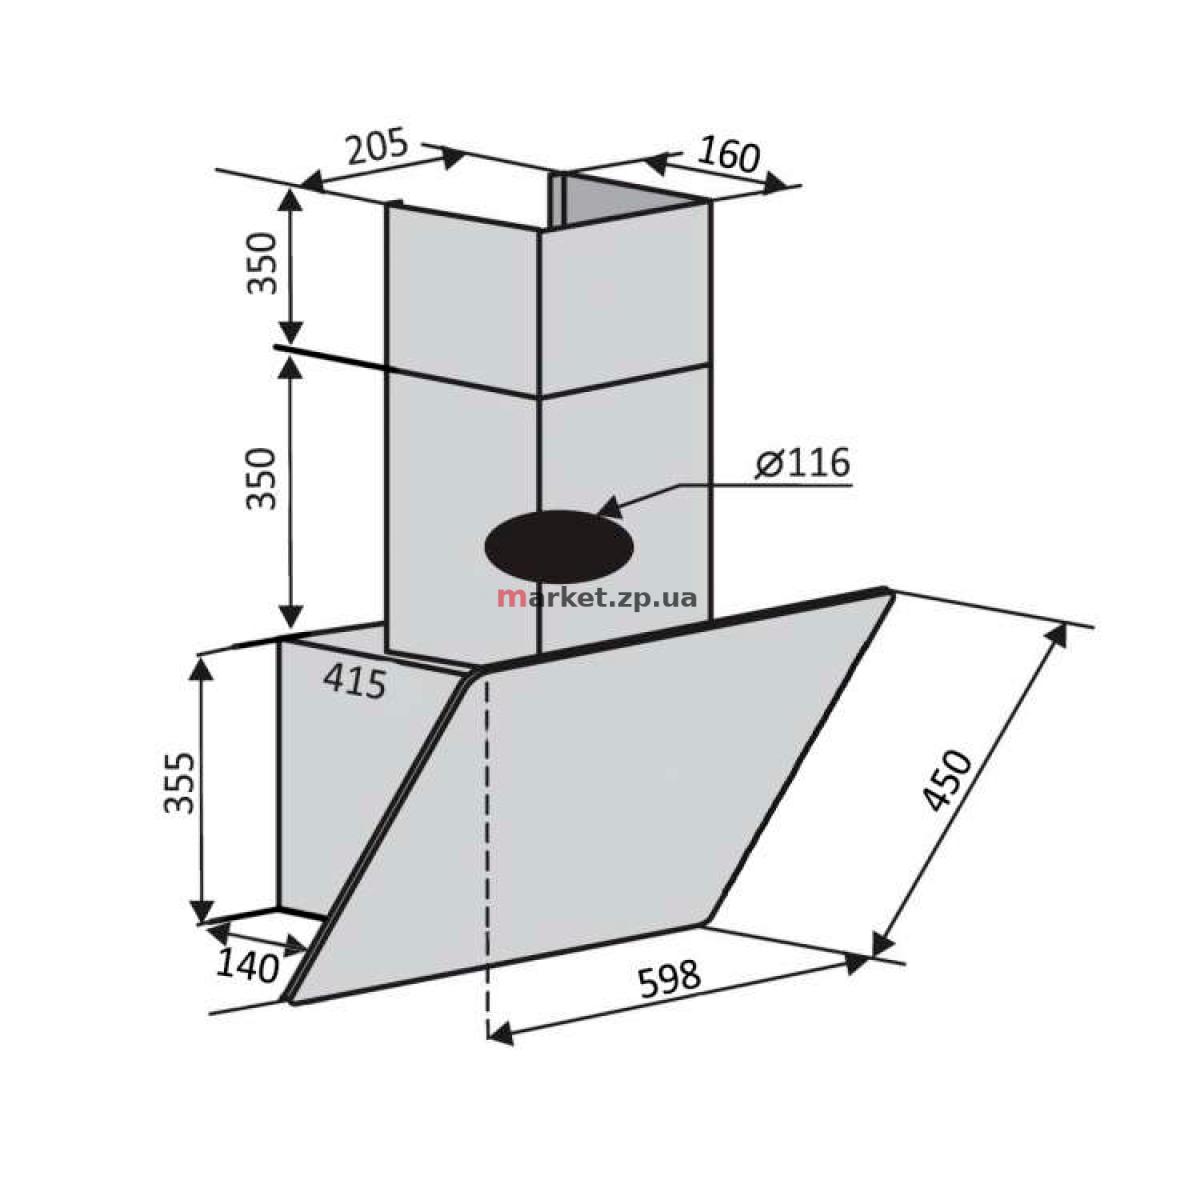 Вытяжка VENTOLUX MODENA 60 BG/X (650) PB